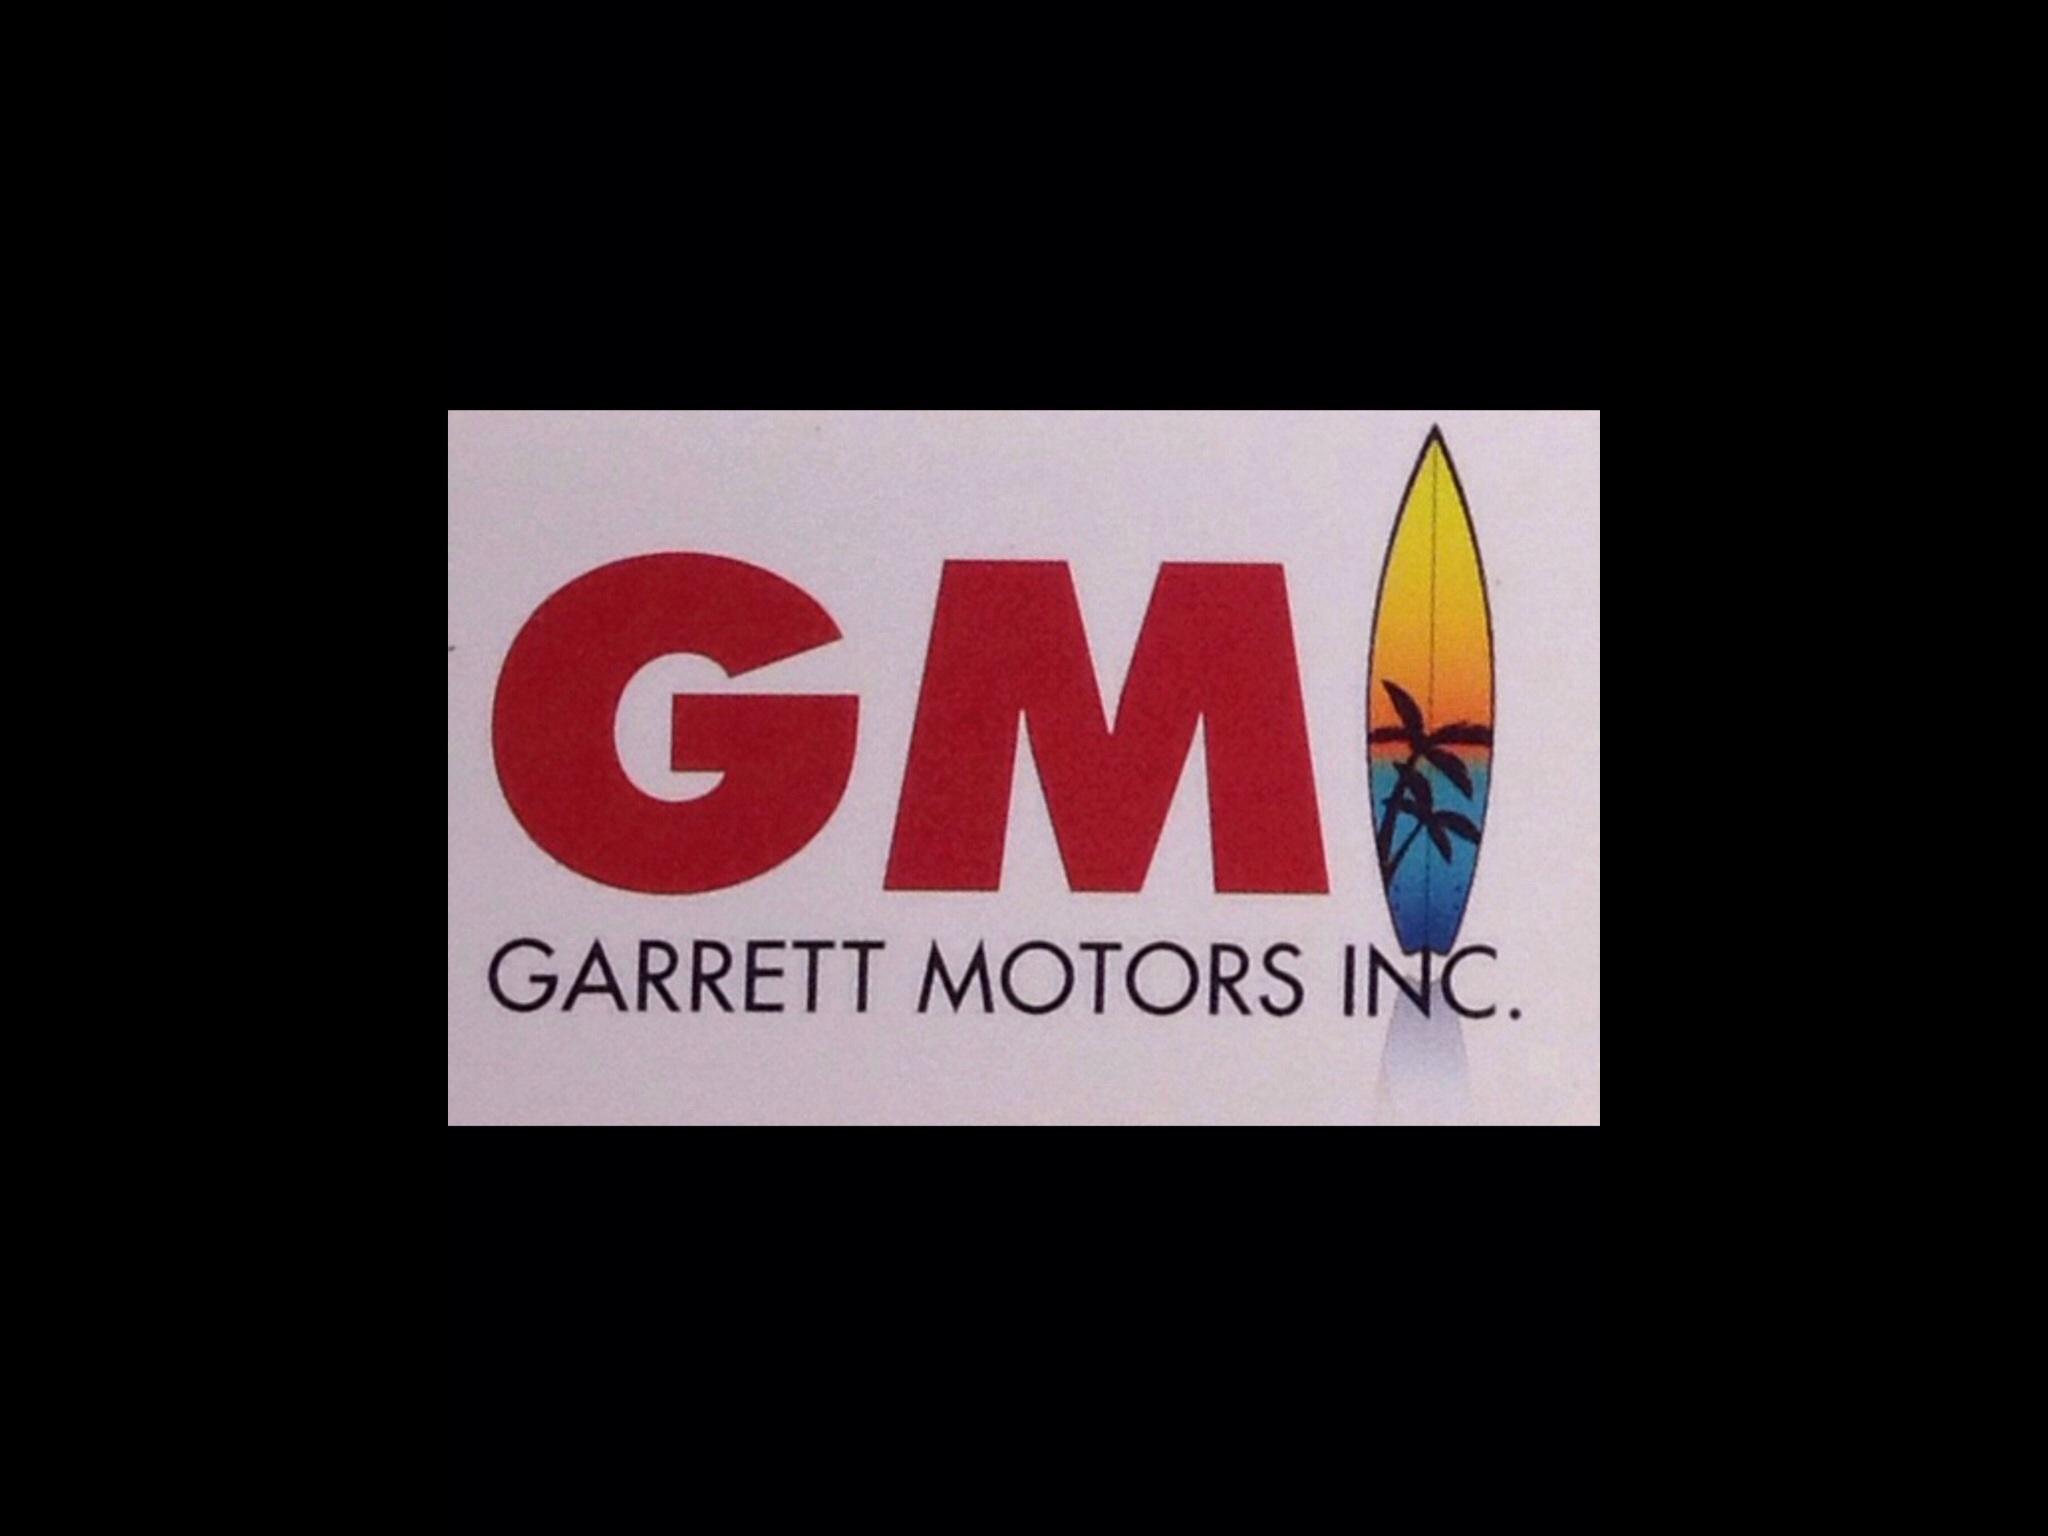 Garrett Motors Inc 405 n orange st New Smyrna Beach FL YP